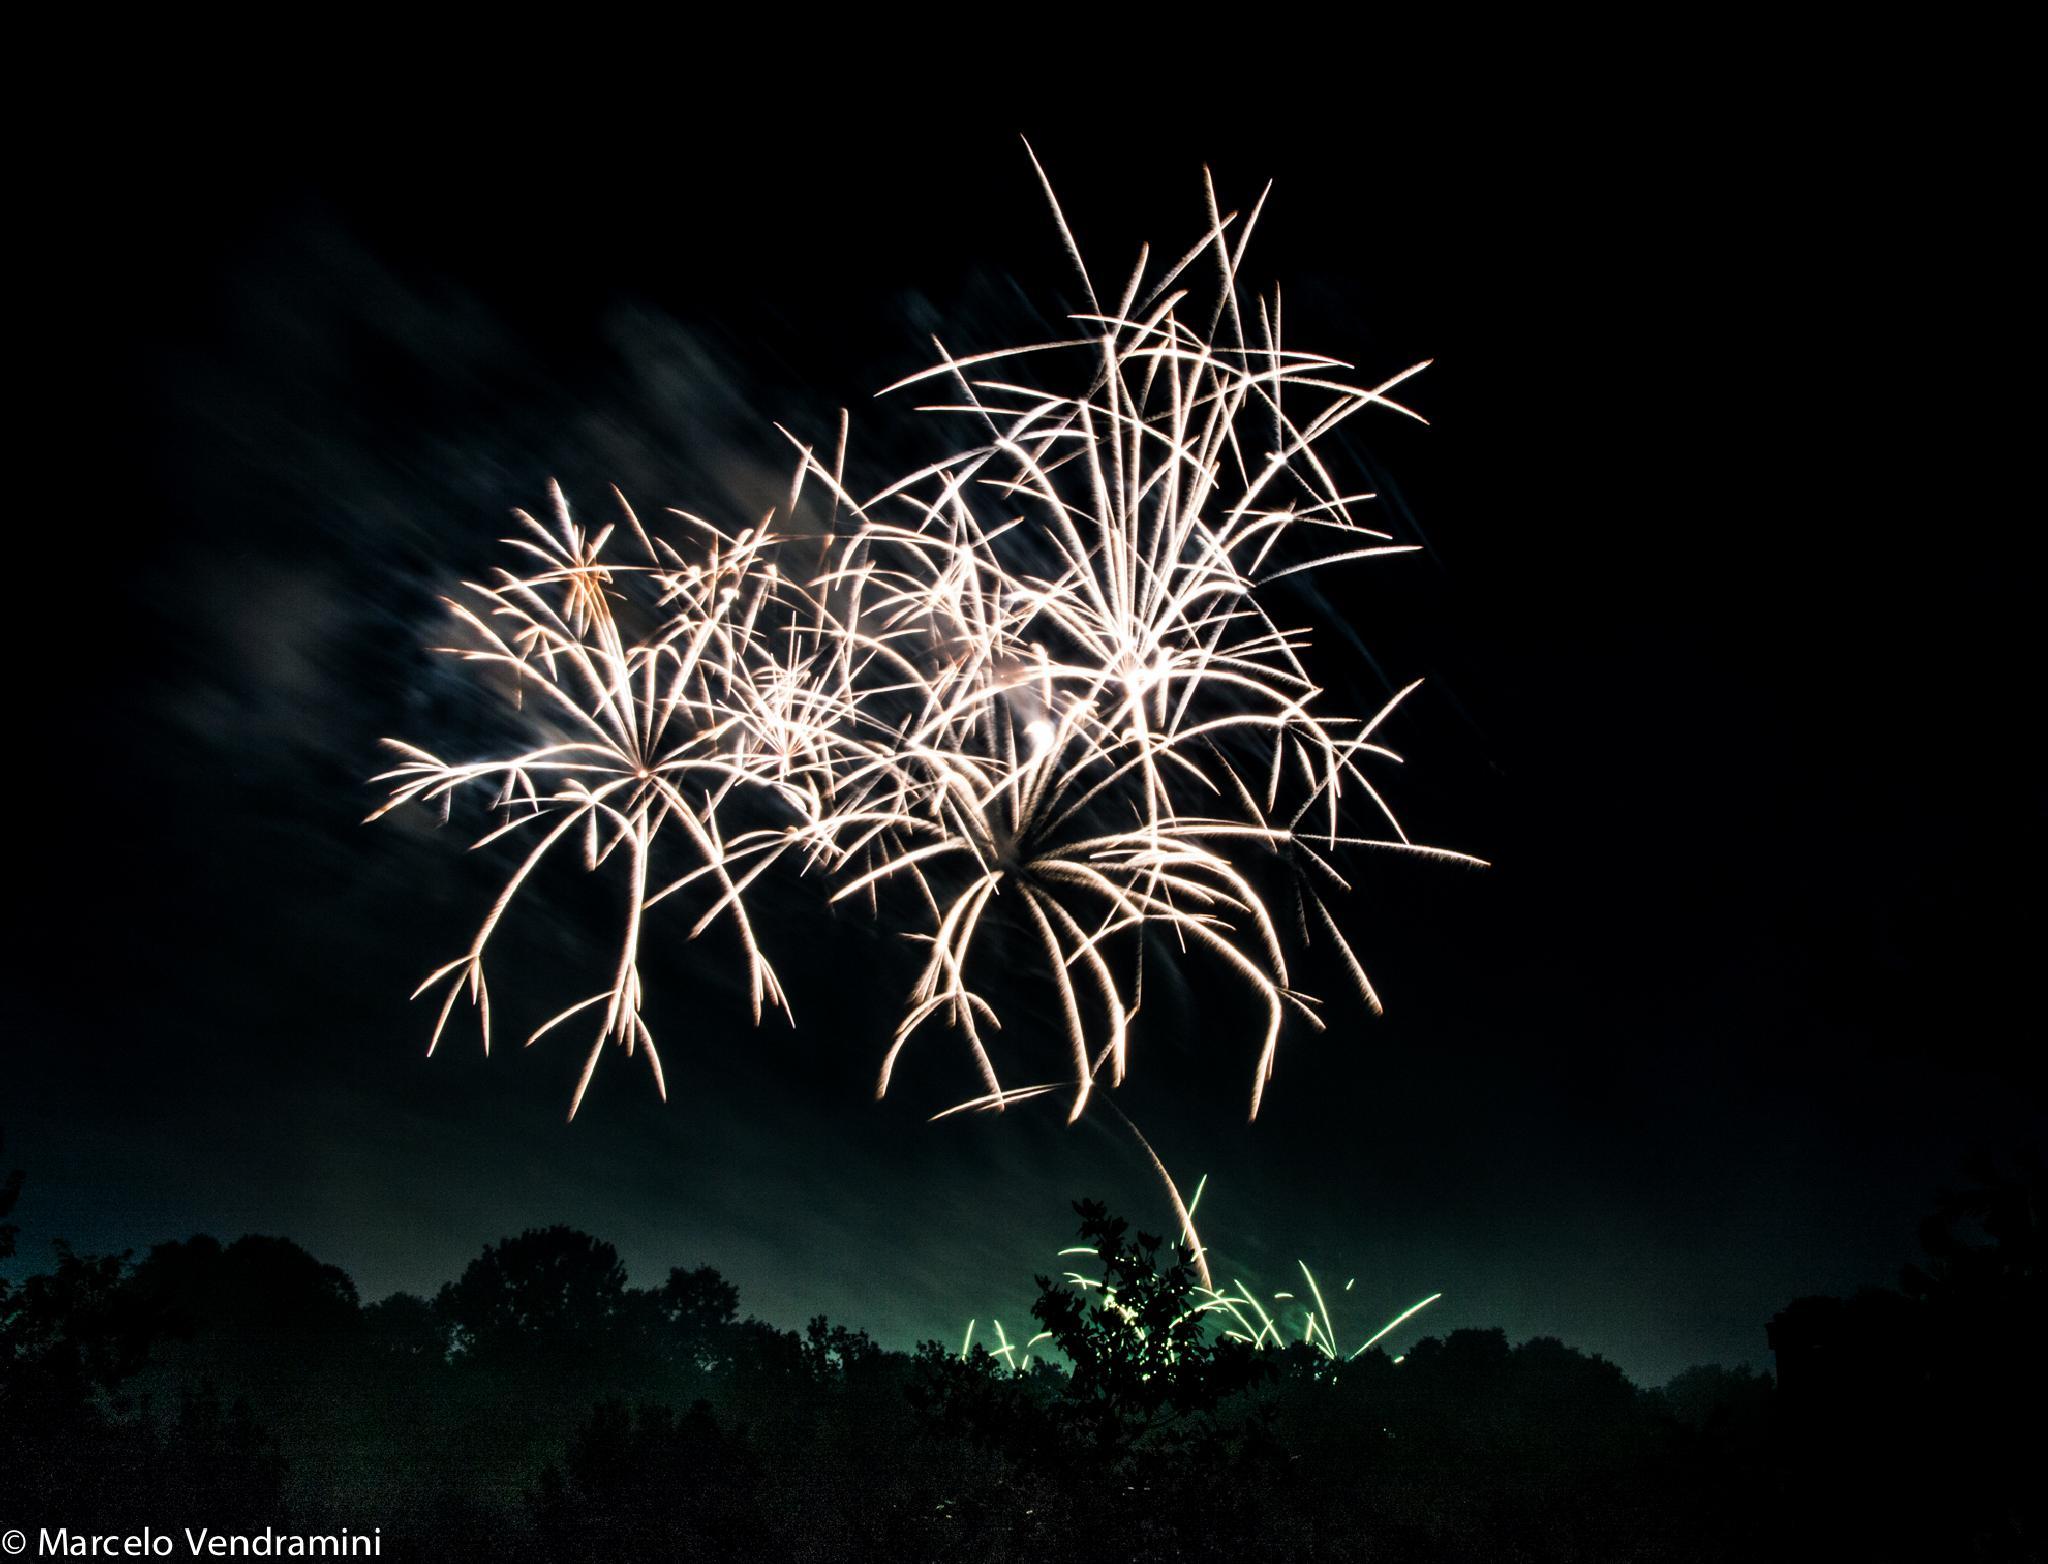 Fireworks San Giovanni in Monza, Italy by Marcelo Vendramini